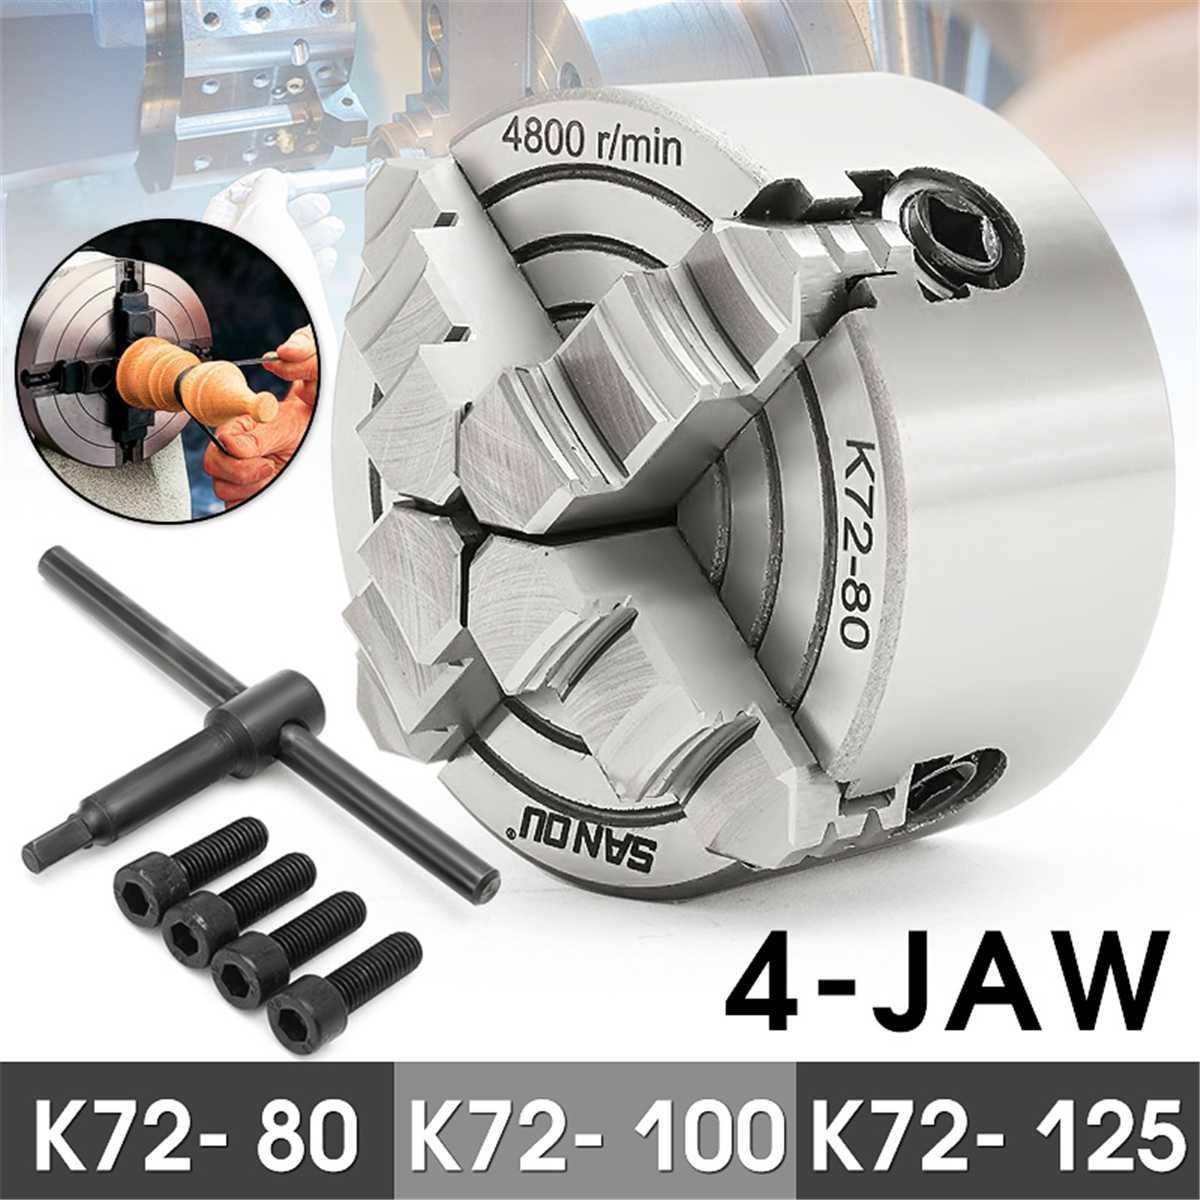 K72- 80/K72- 100/K72- 125 4 Jaw Lathe Chuck Independent 80mm/100mm/125mm Self-Centering 1pcs Safety Chuck Key 3pcs Mounting Bolt